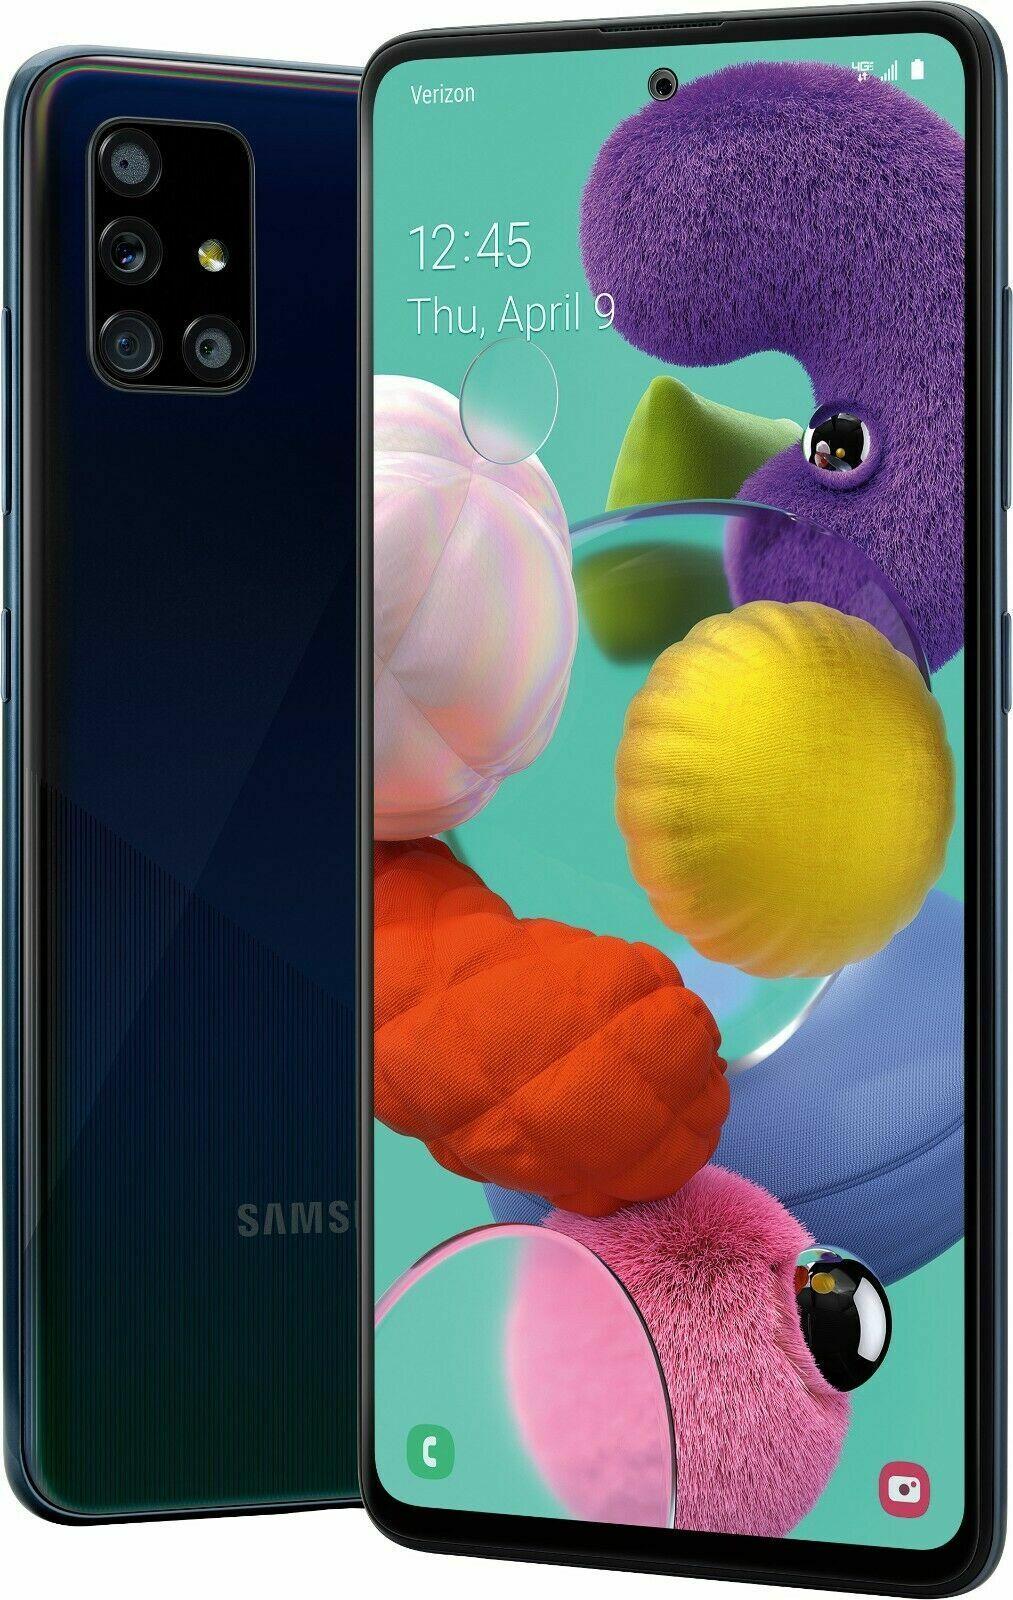 Android Phone - Samsung Galaxy A51 SM-A515U - 128GB - Prism Crush Black (Verizon) (Single SIM)